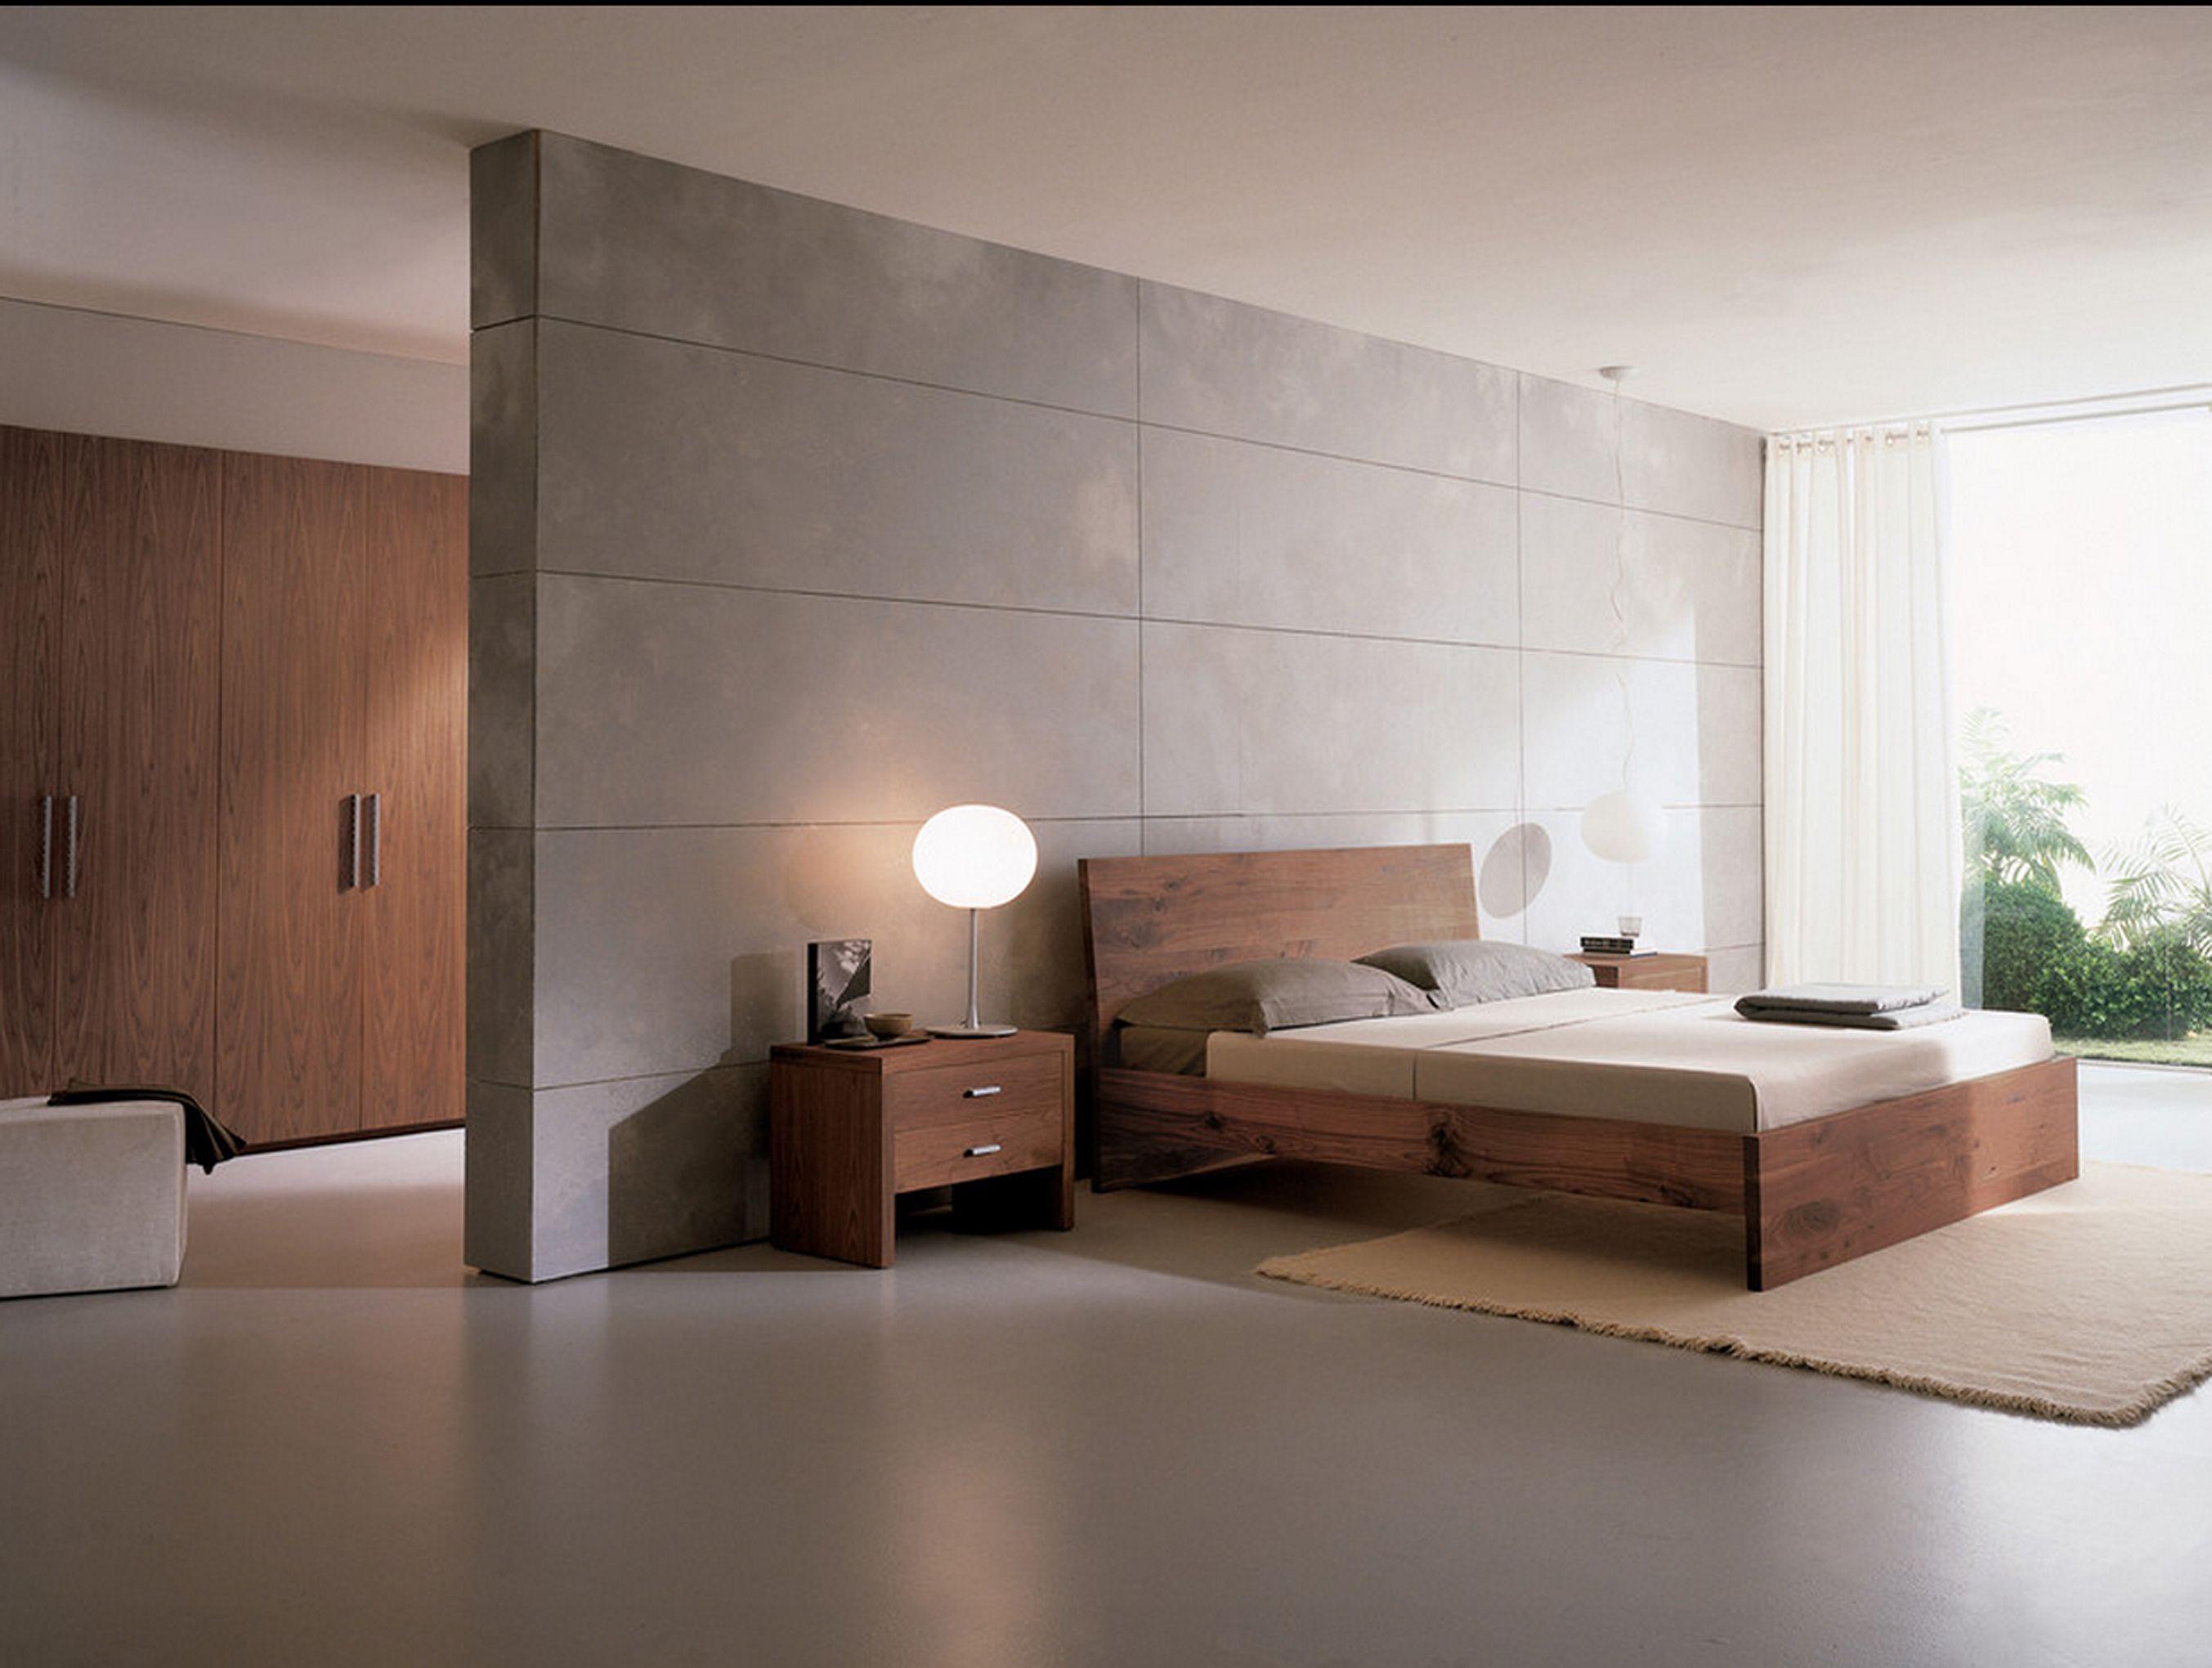 Modern Main Bedroom Designs Impressive Viroc #walls Httpwwwbaarsbloemhoffnlonzemerkenviroc Inspiration Design